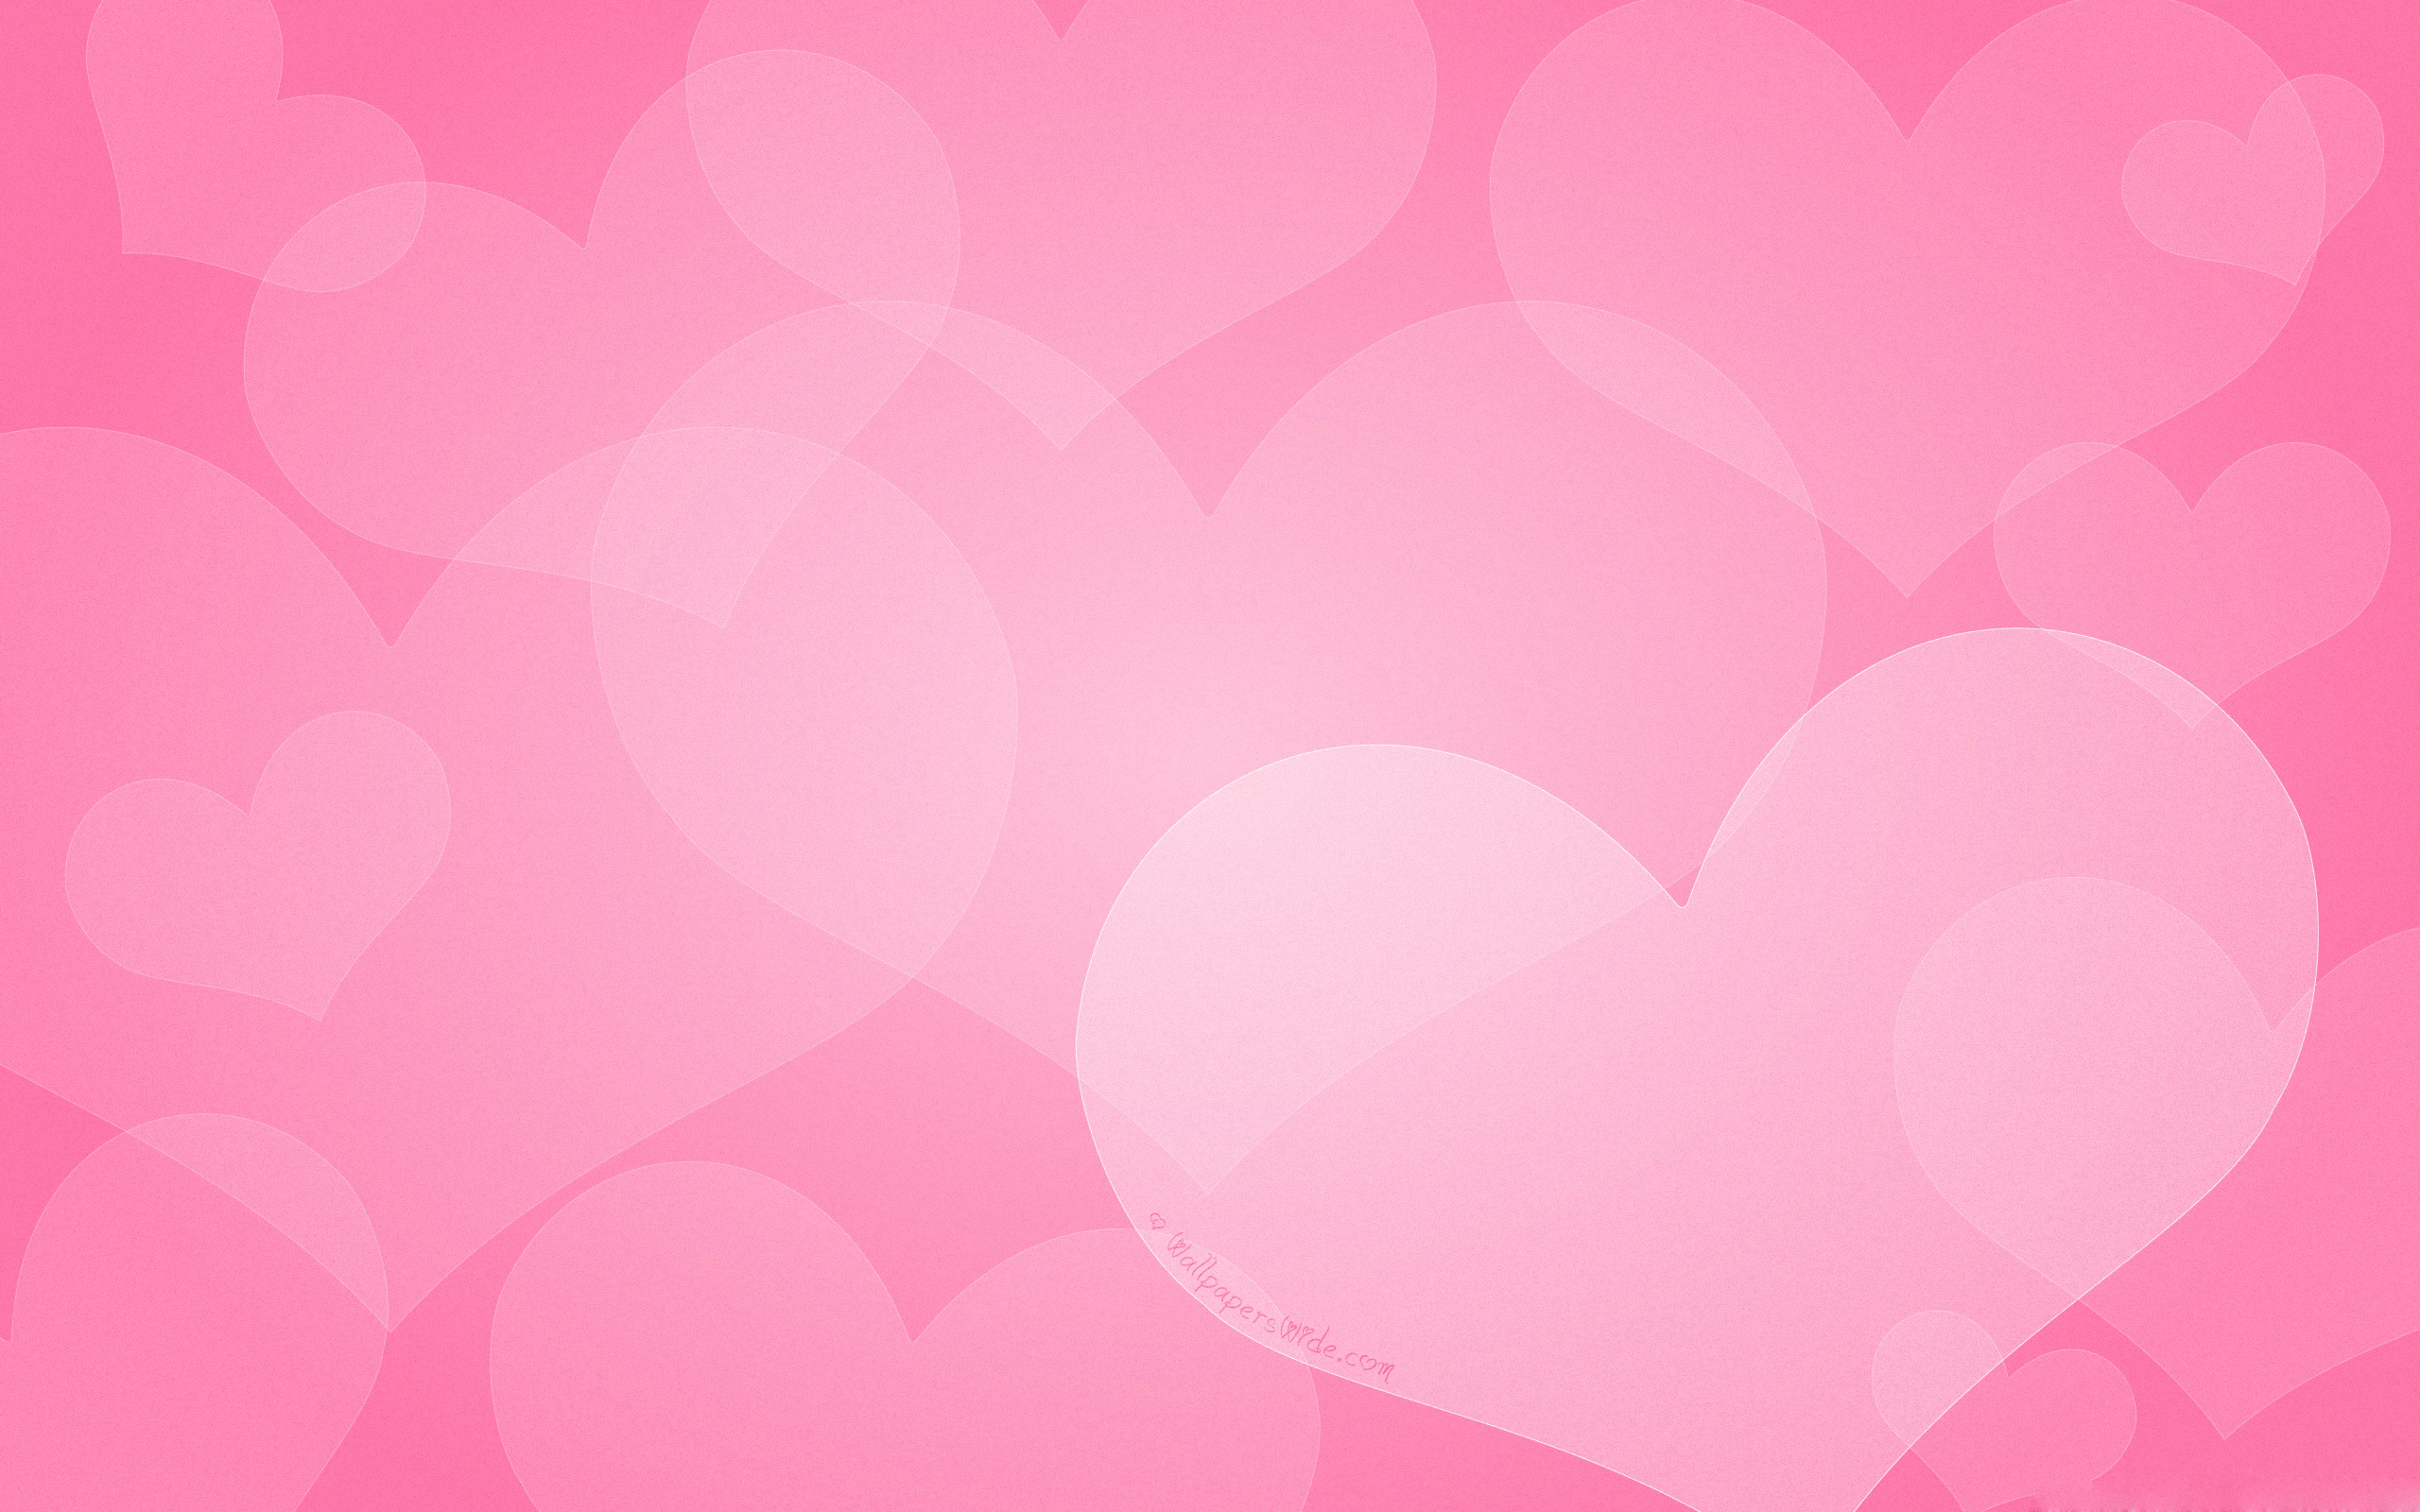 Free Download Desktop Valentines Hd Wallpapers 2560x1600